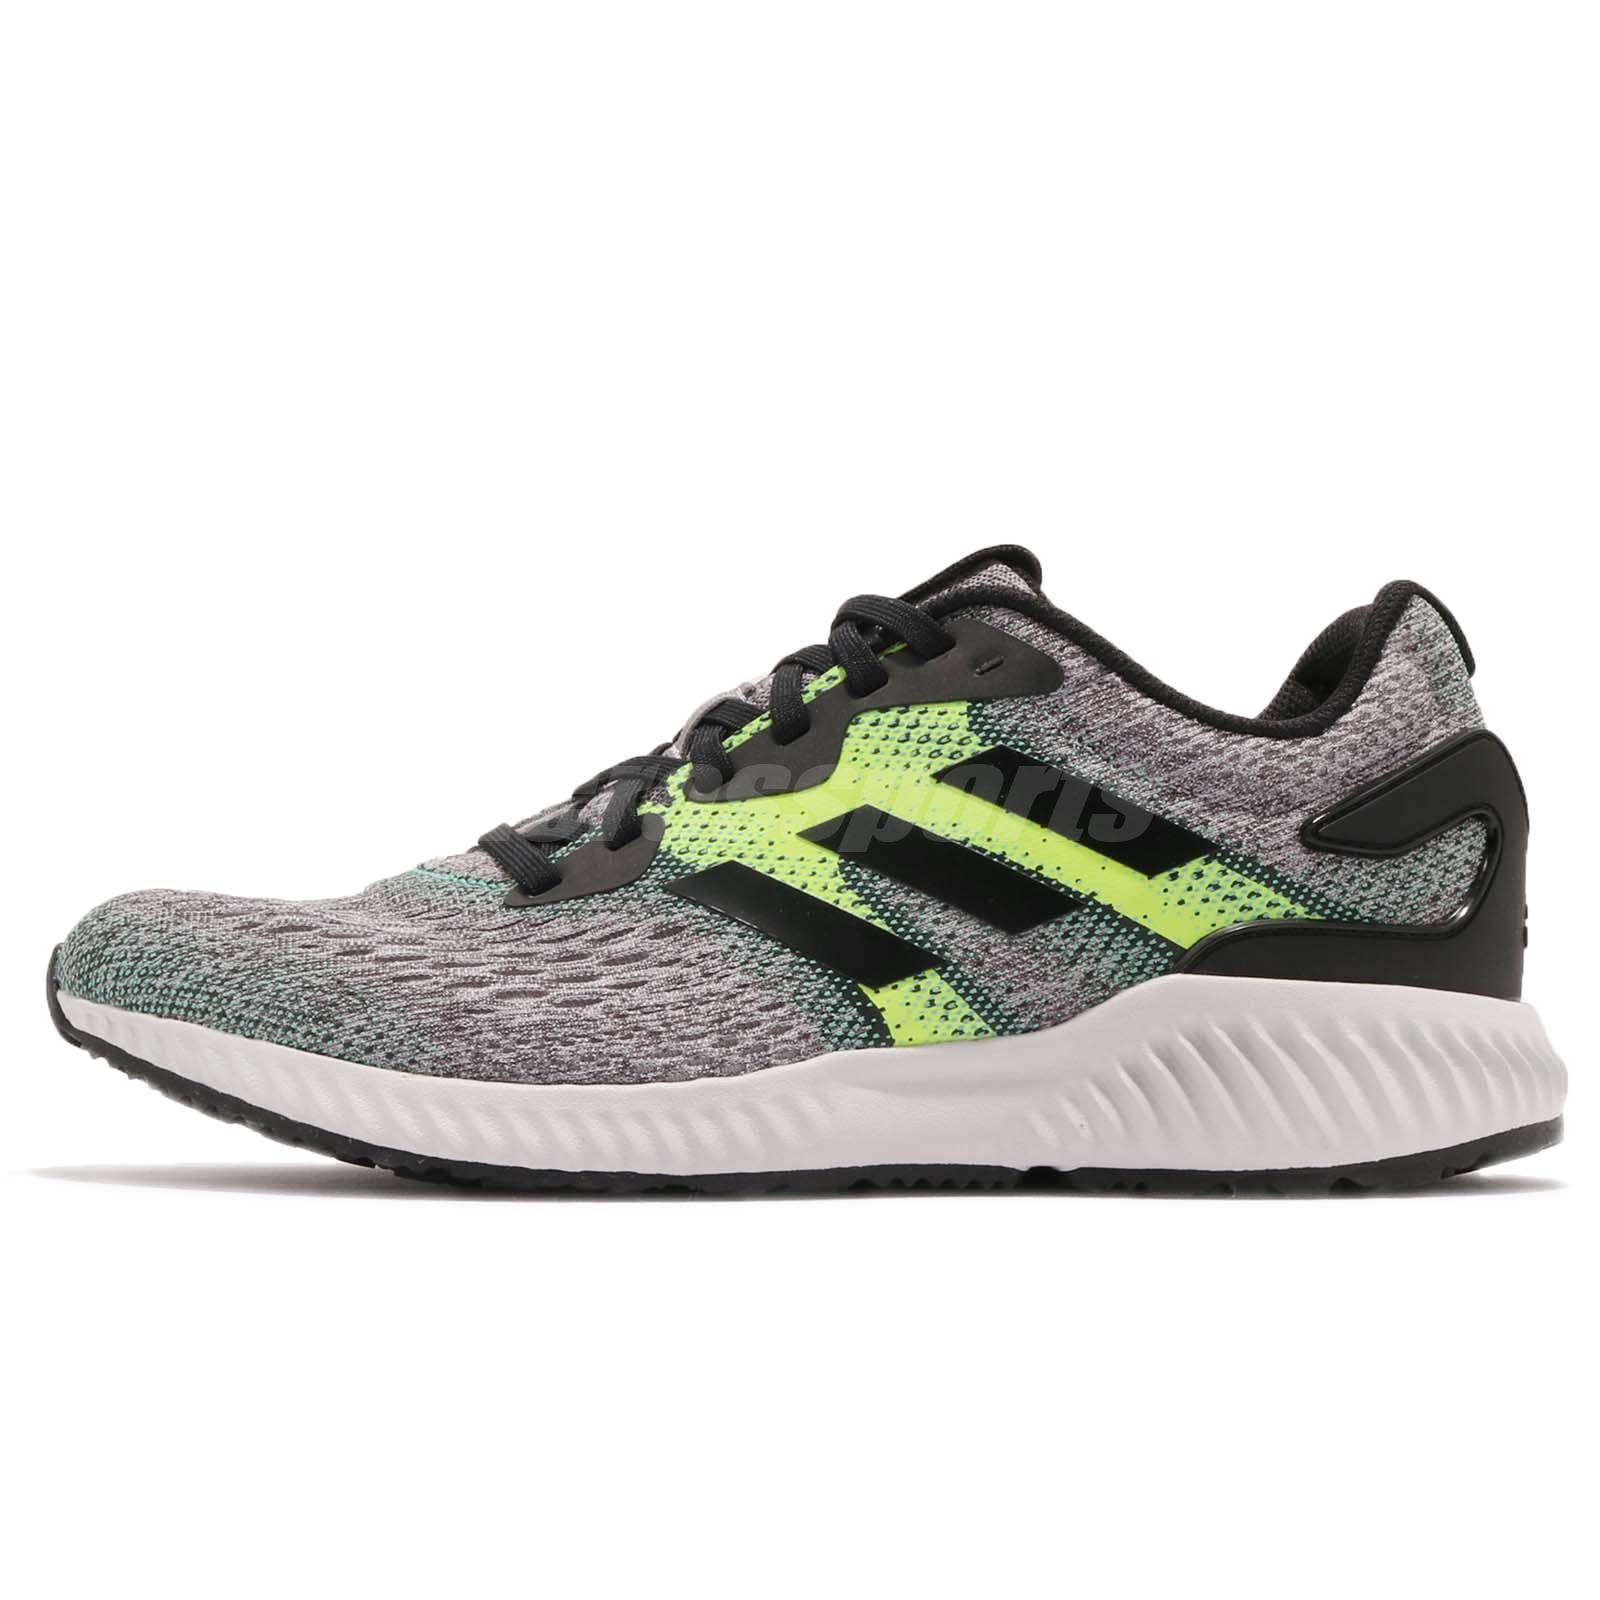 adidas aerobounce m formation gris gris gris - vert chaussures hommes en noir 202eed